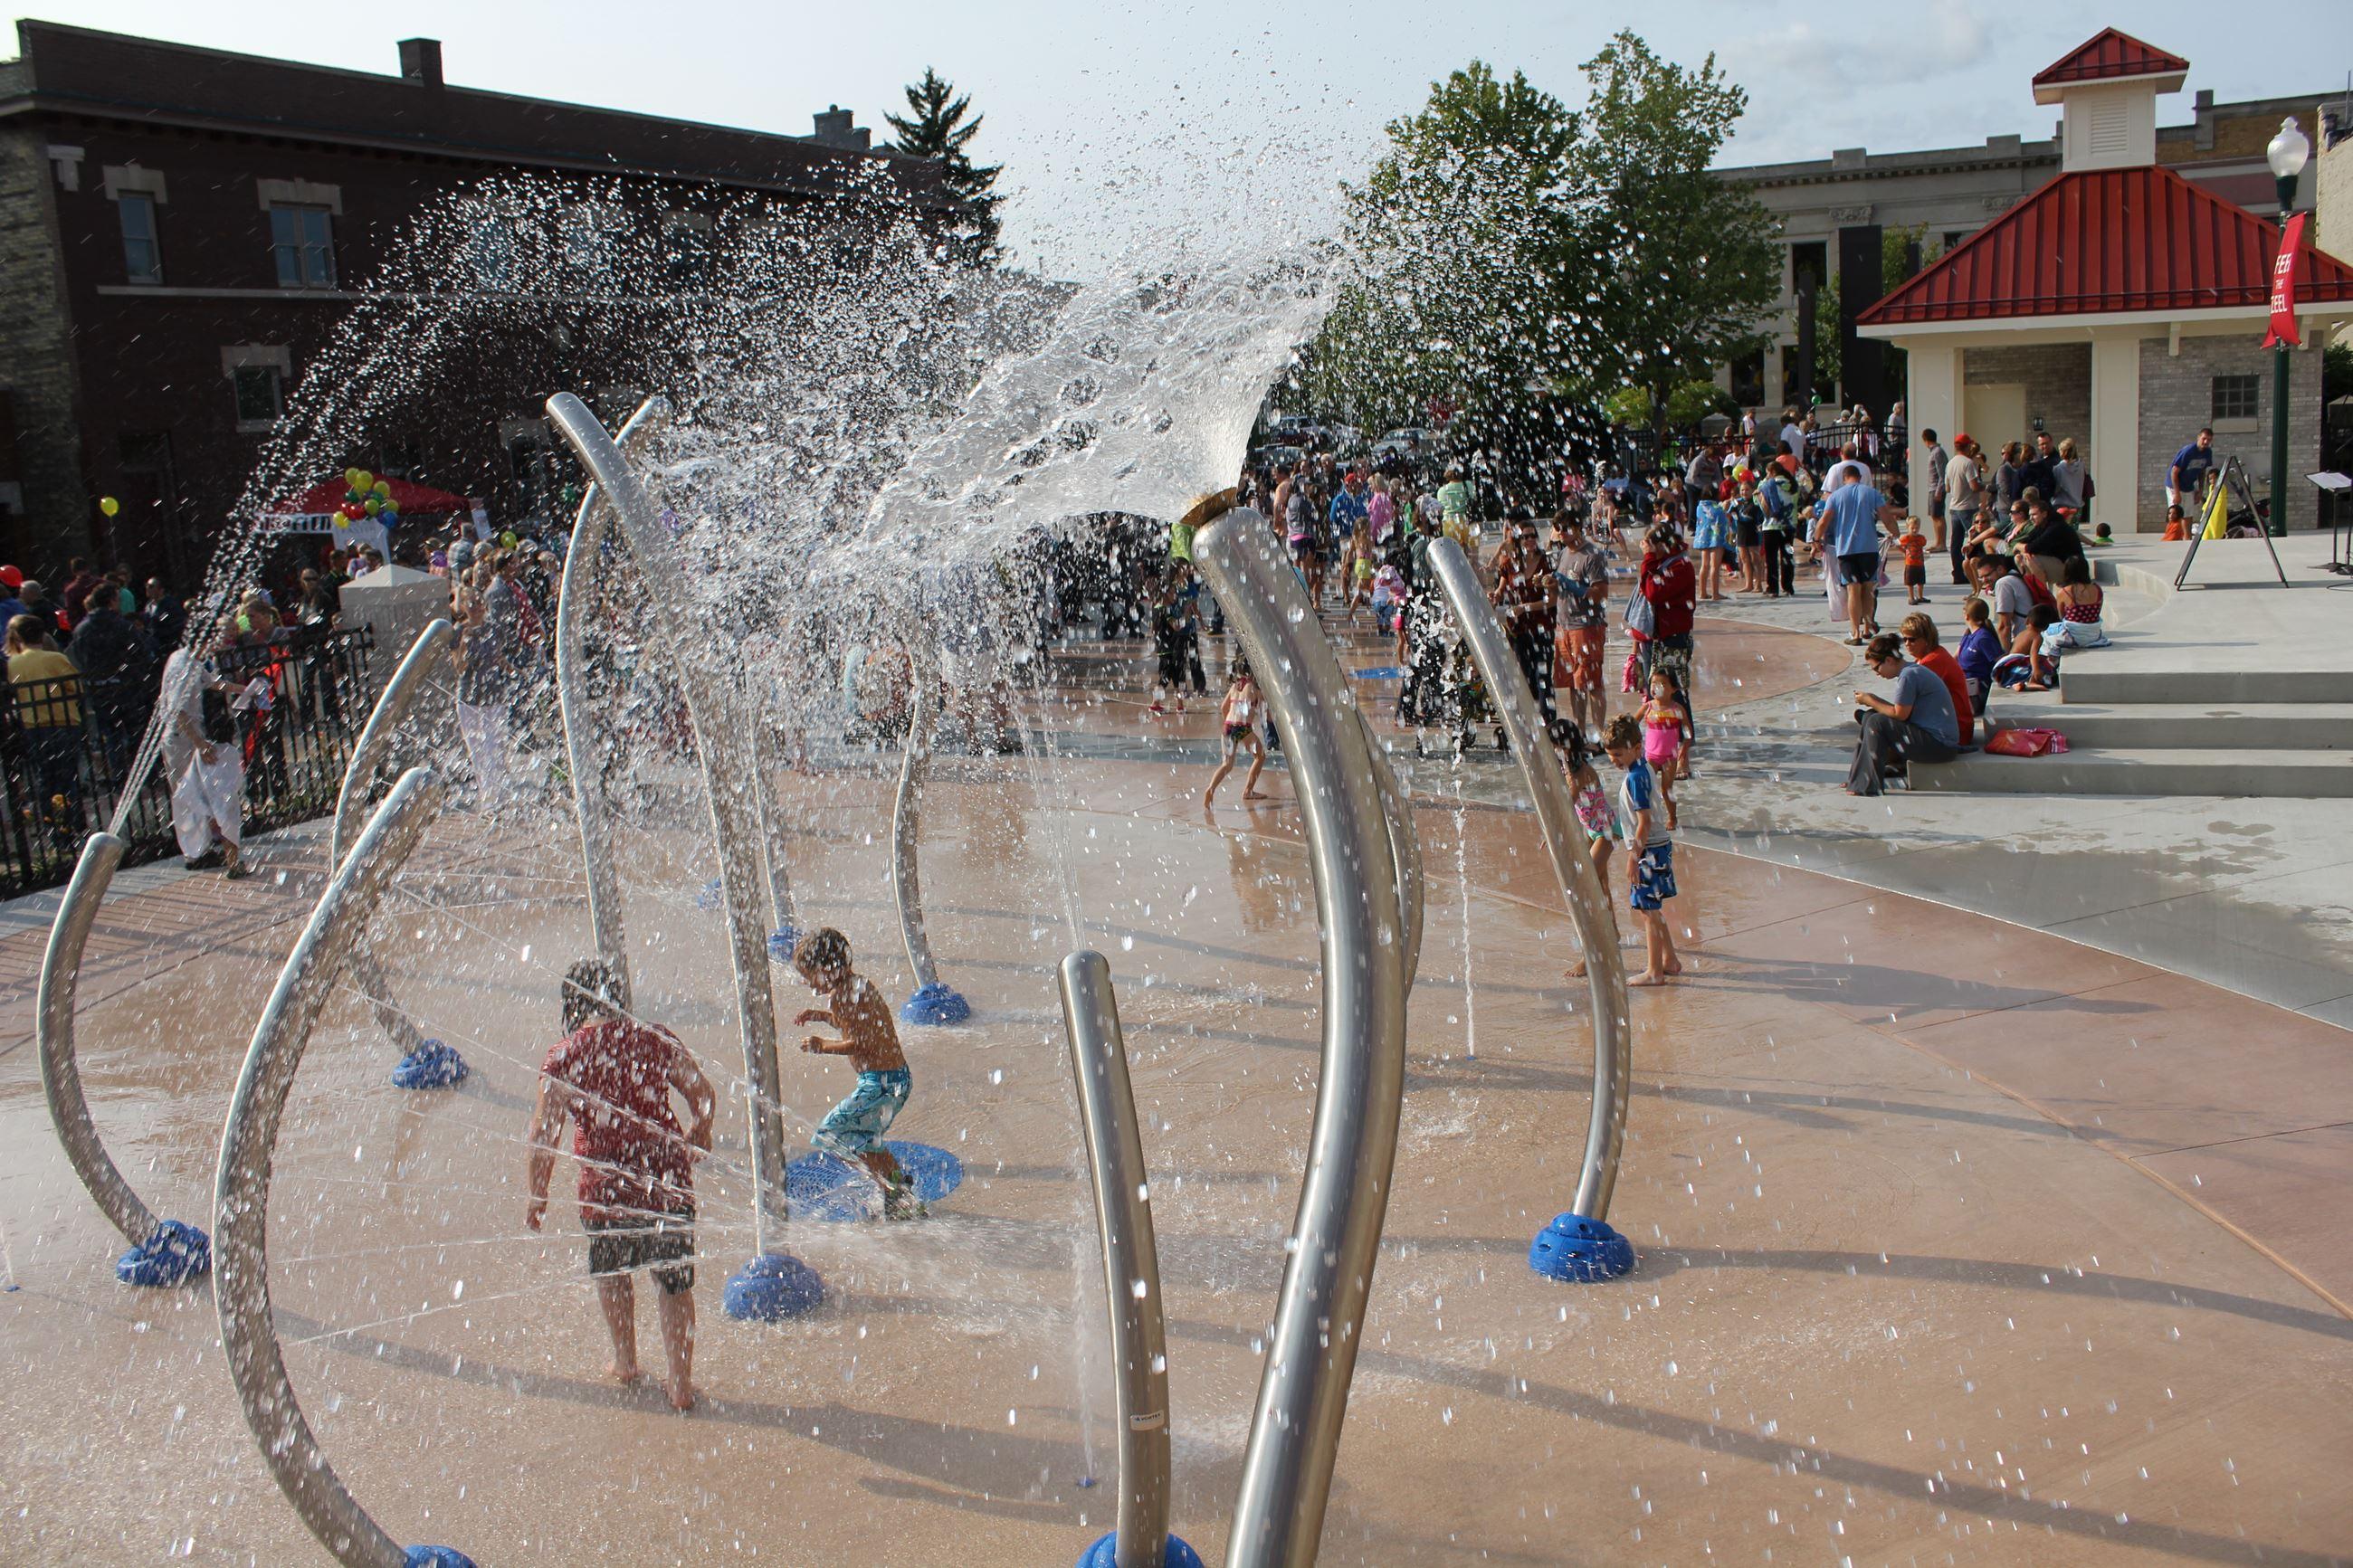 Photo of Splash Pad Water Park in Zeeland Michigan